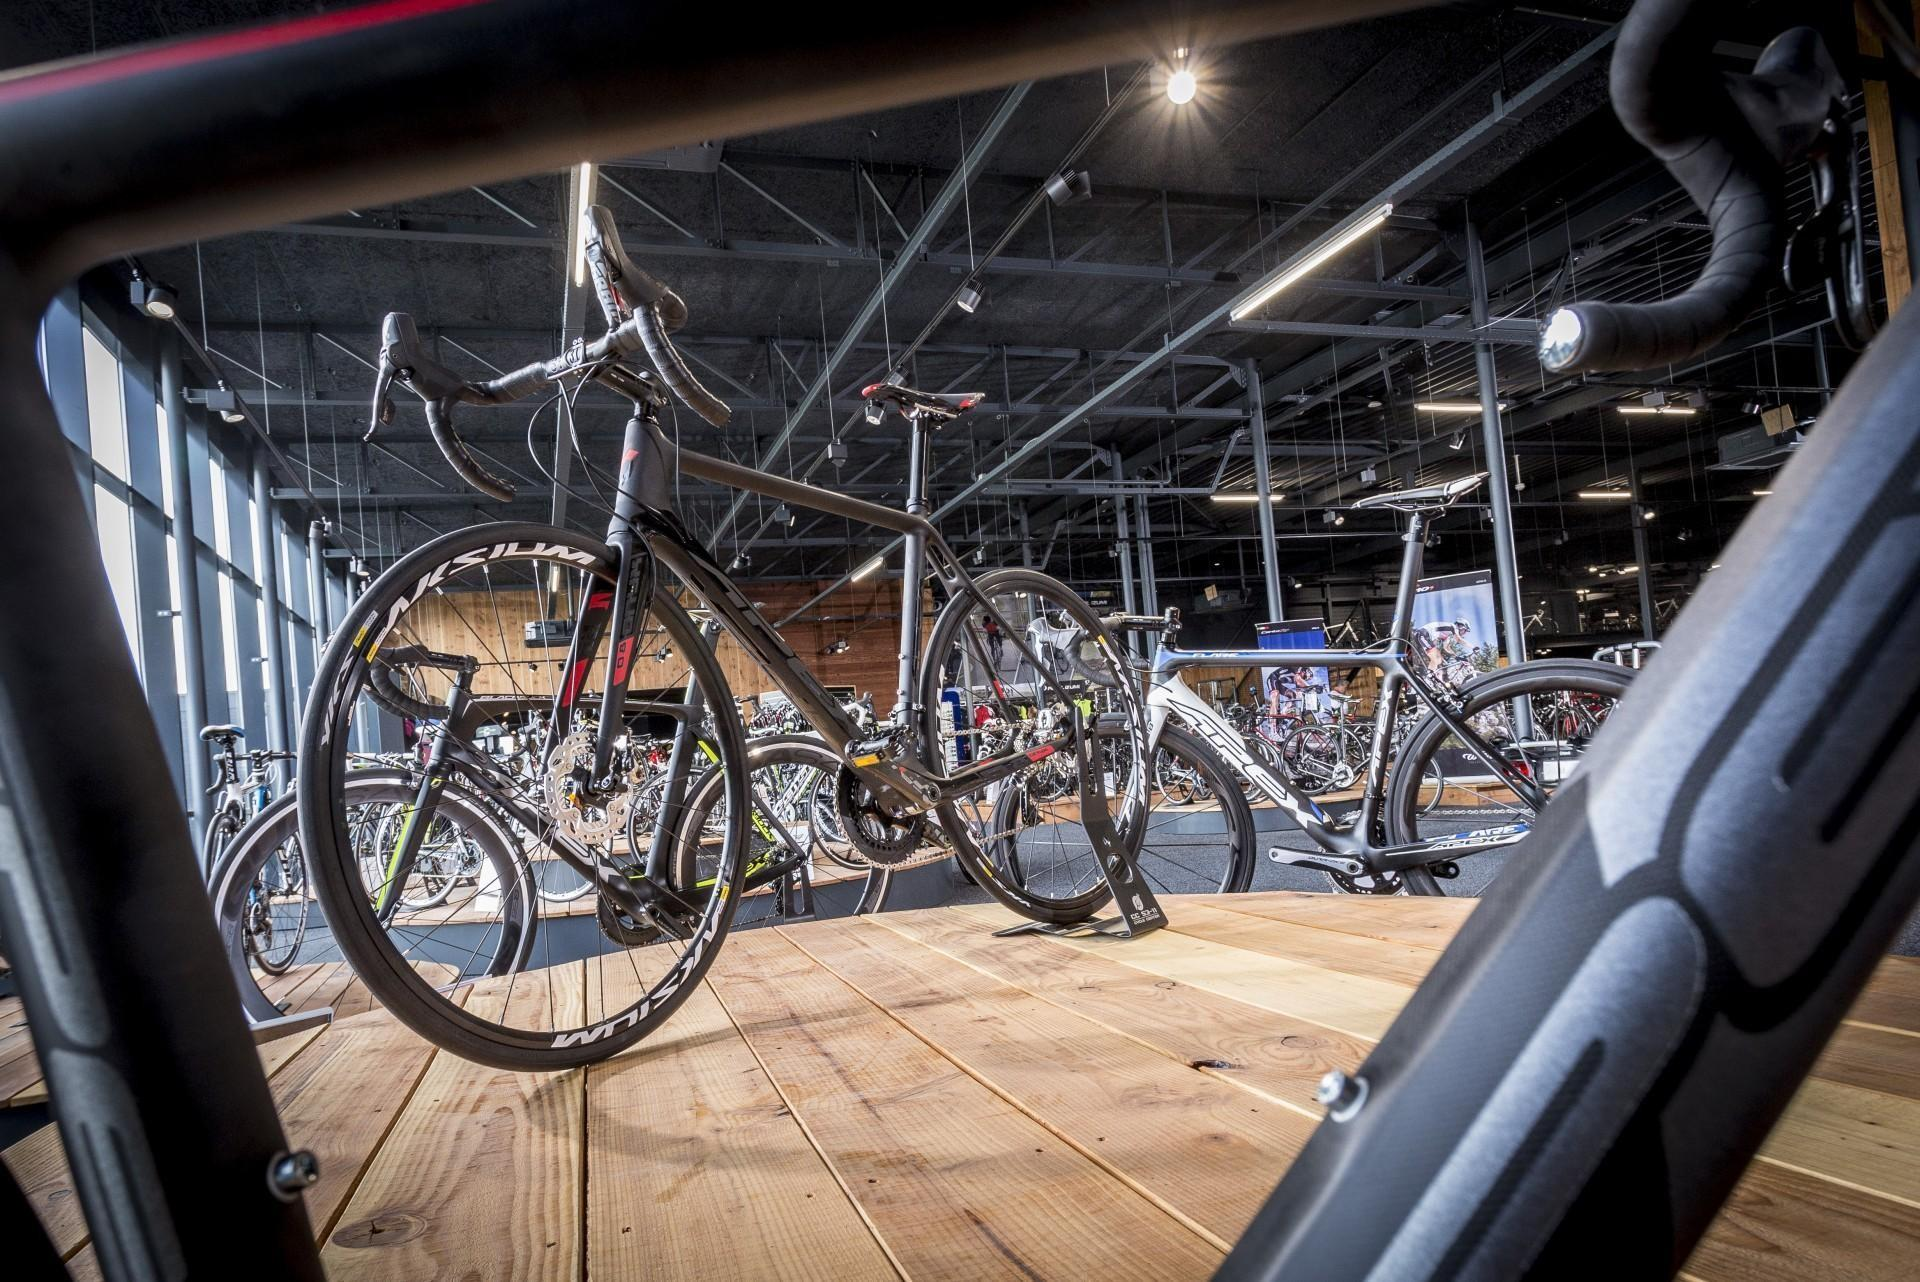 Cycle Center Zaltbommel 1101.jpg